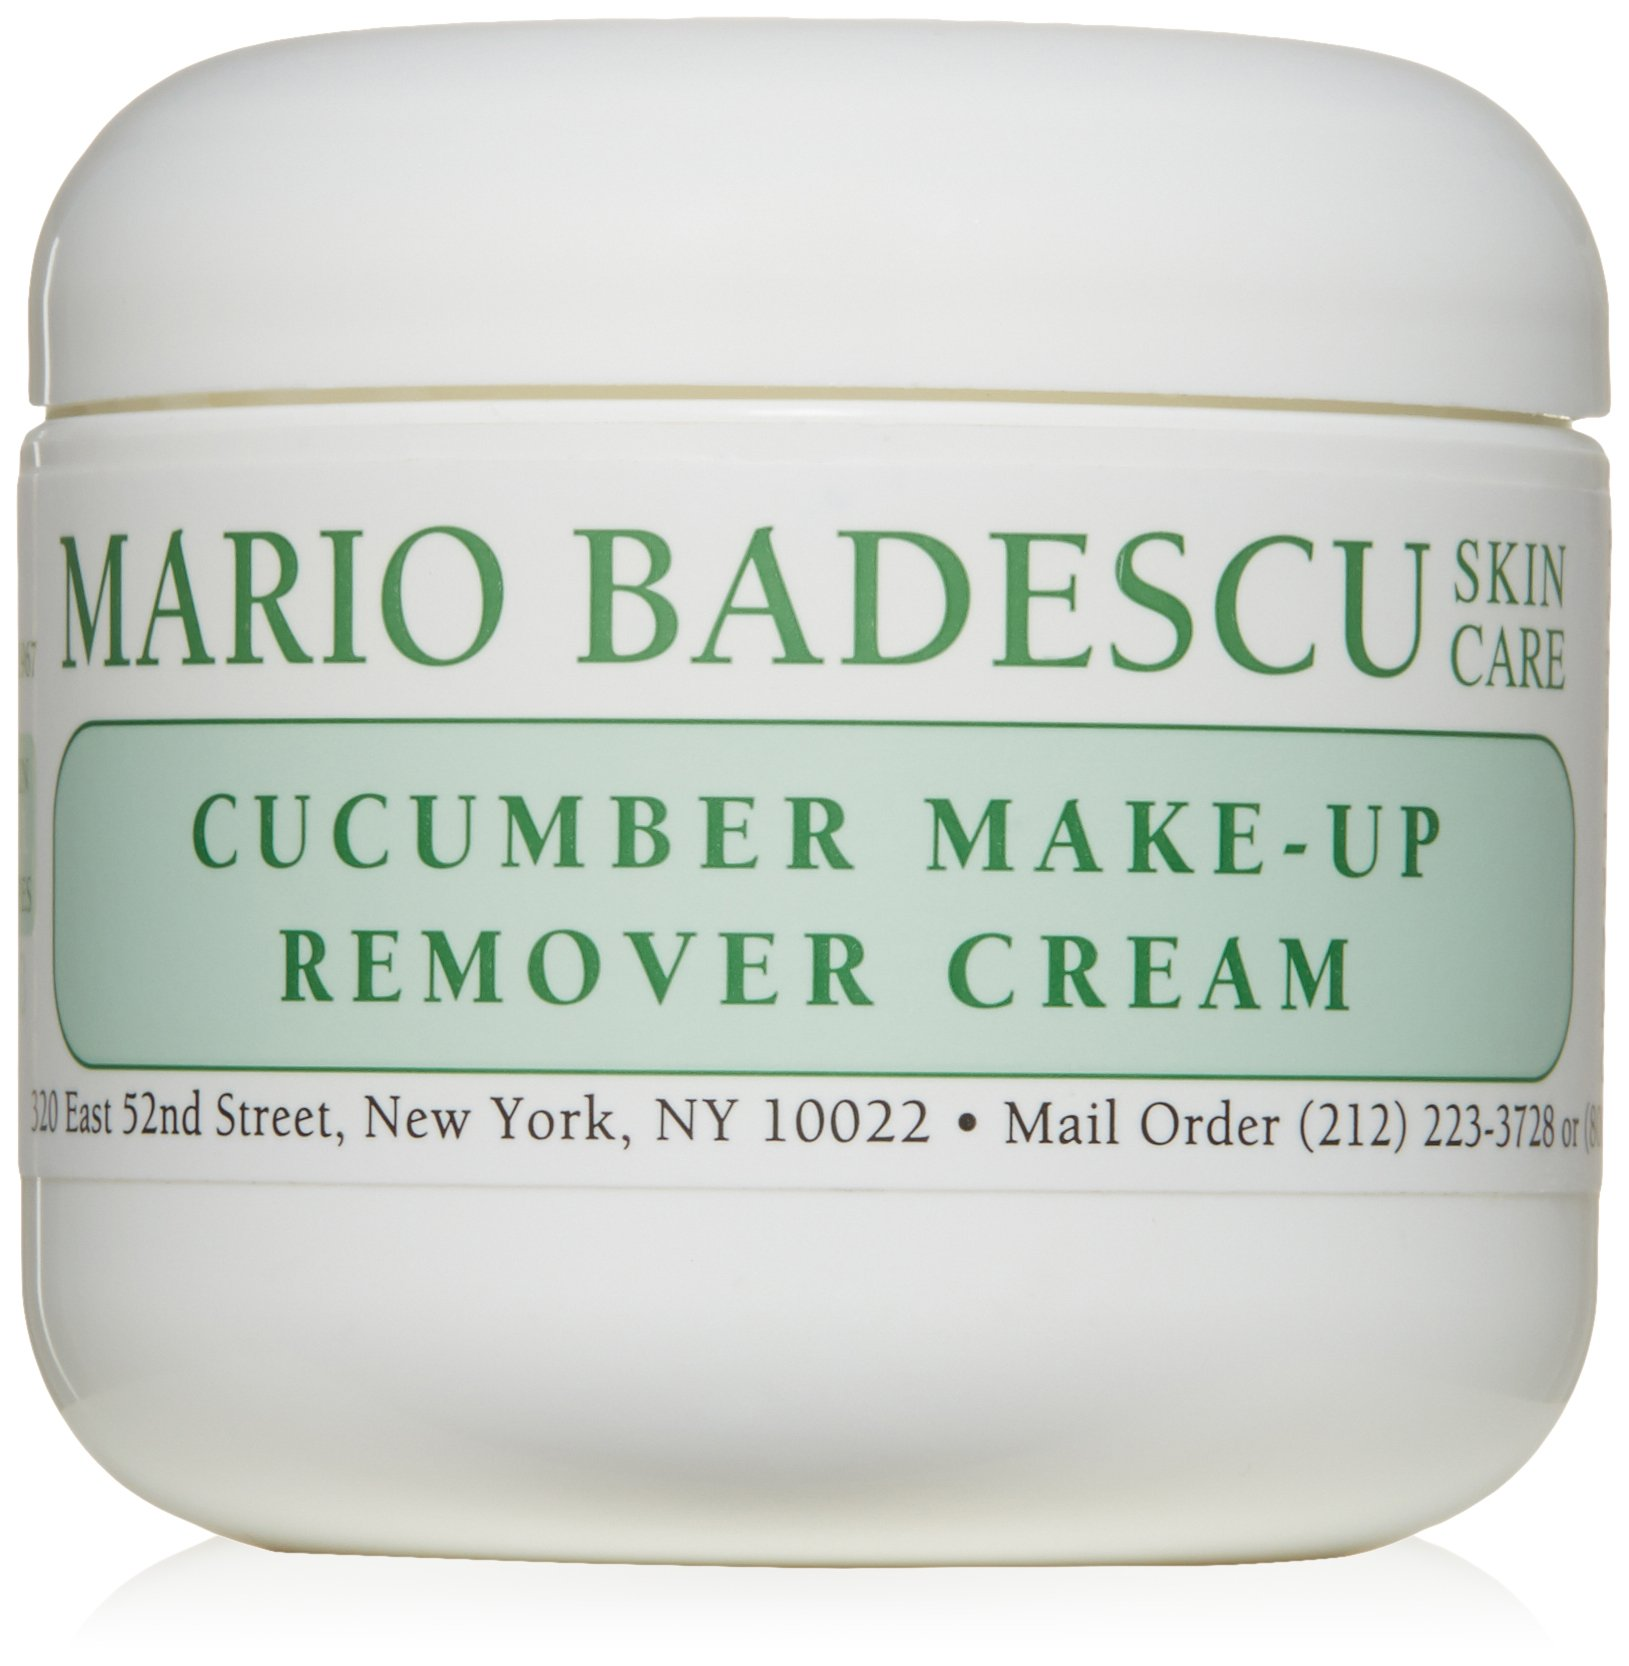 Mario Badescu Cucumber Make-Up Remover Cream, 4 oz.